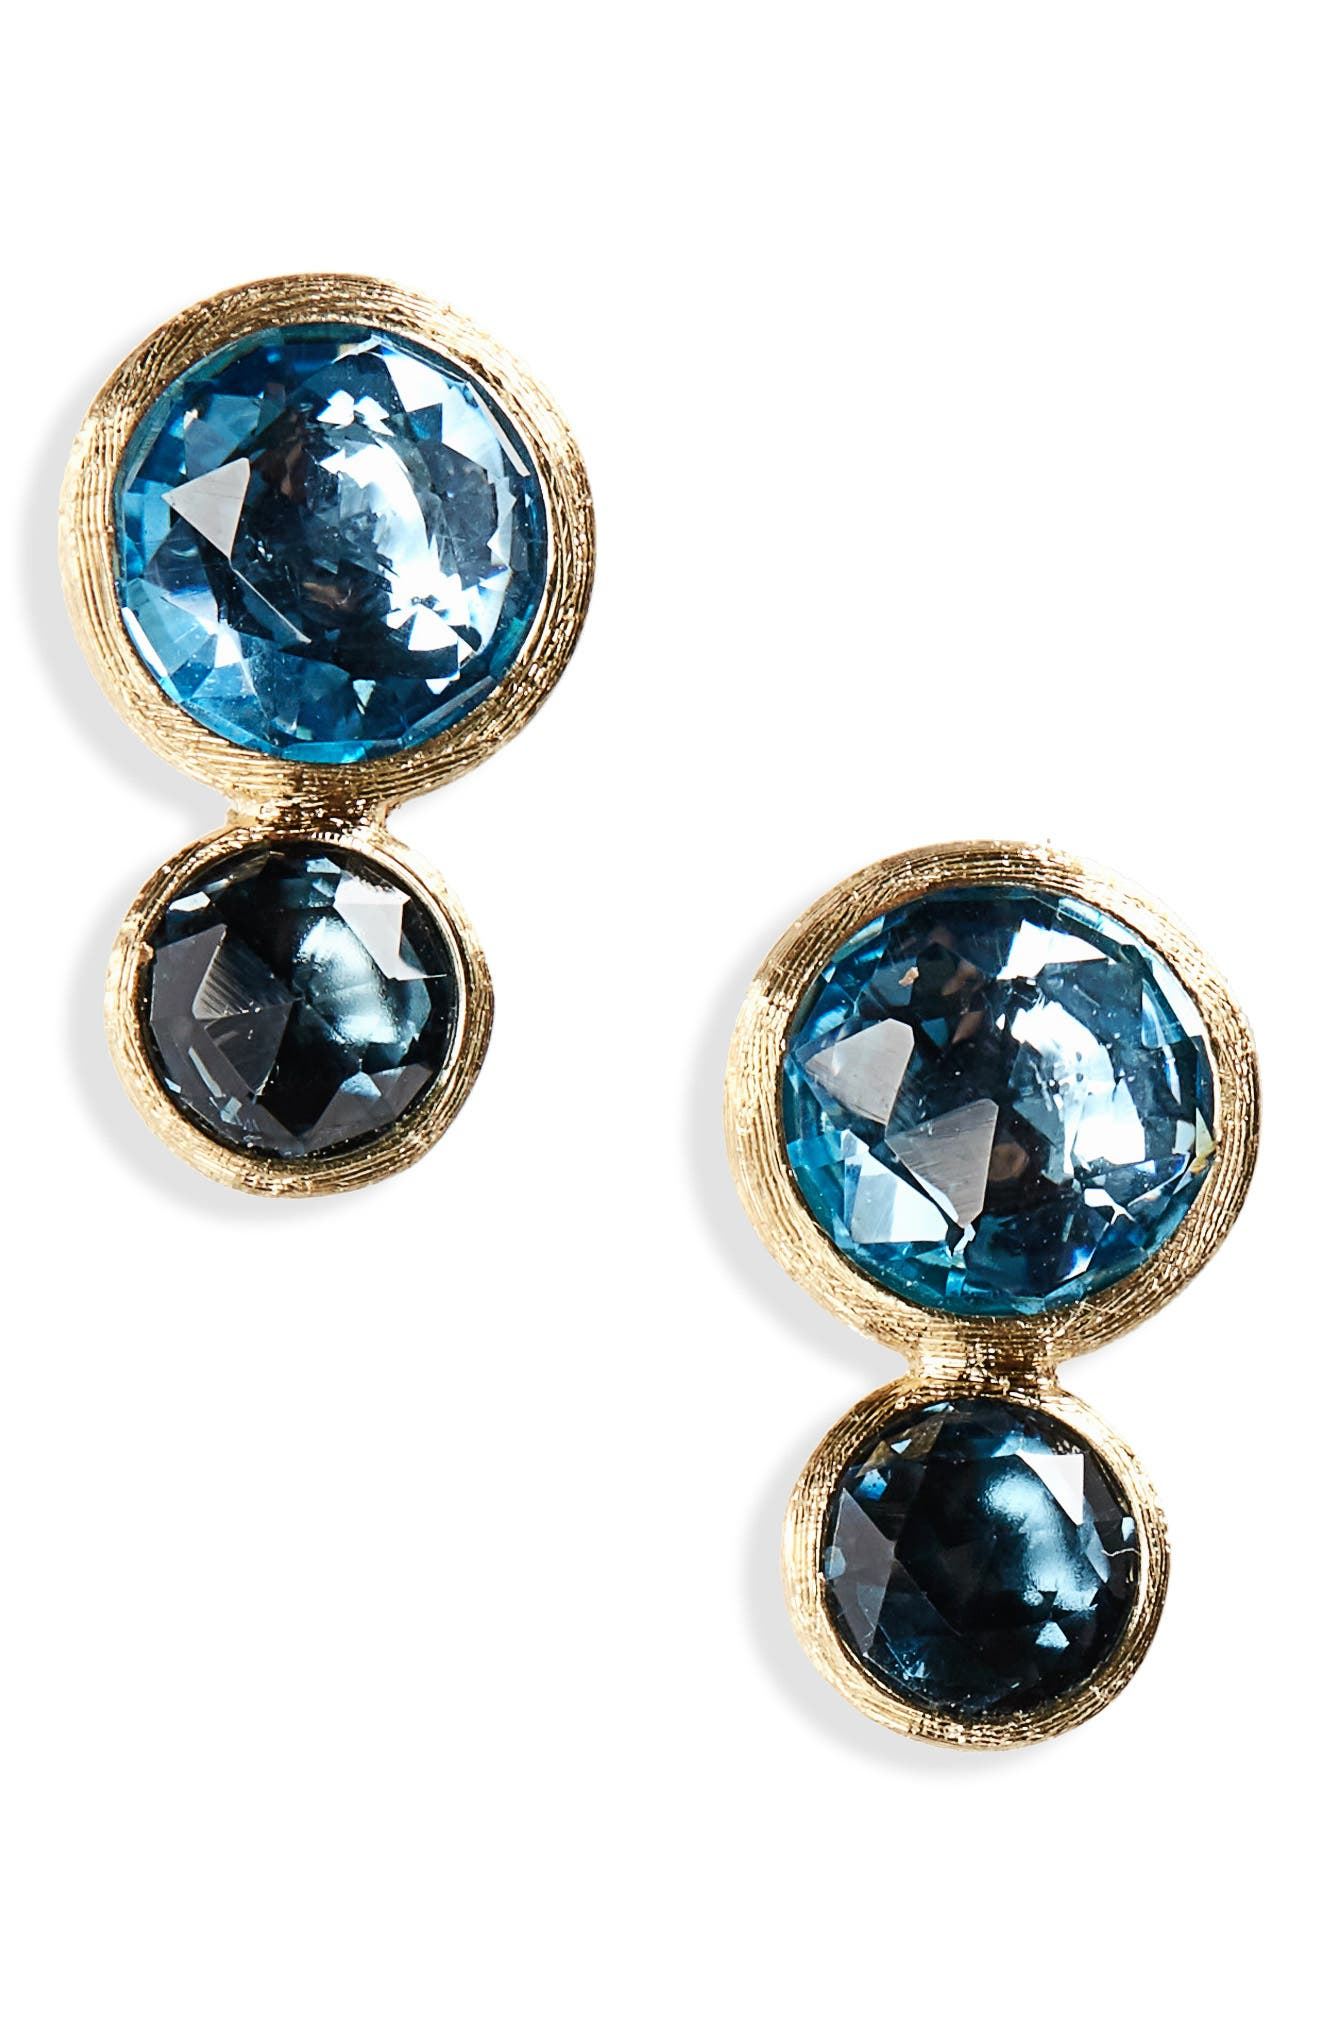 Jaipur 2-Stone Blue Topaz Stud Earrings,                         Main,                         color, Yellow Gold London/ Swiss Blue